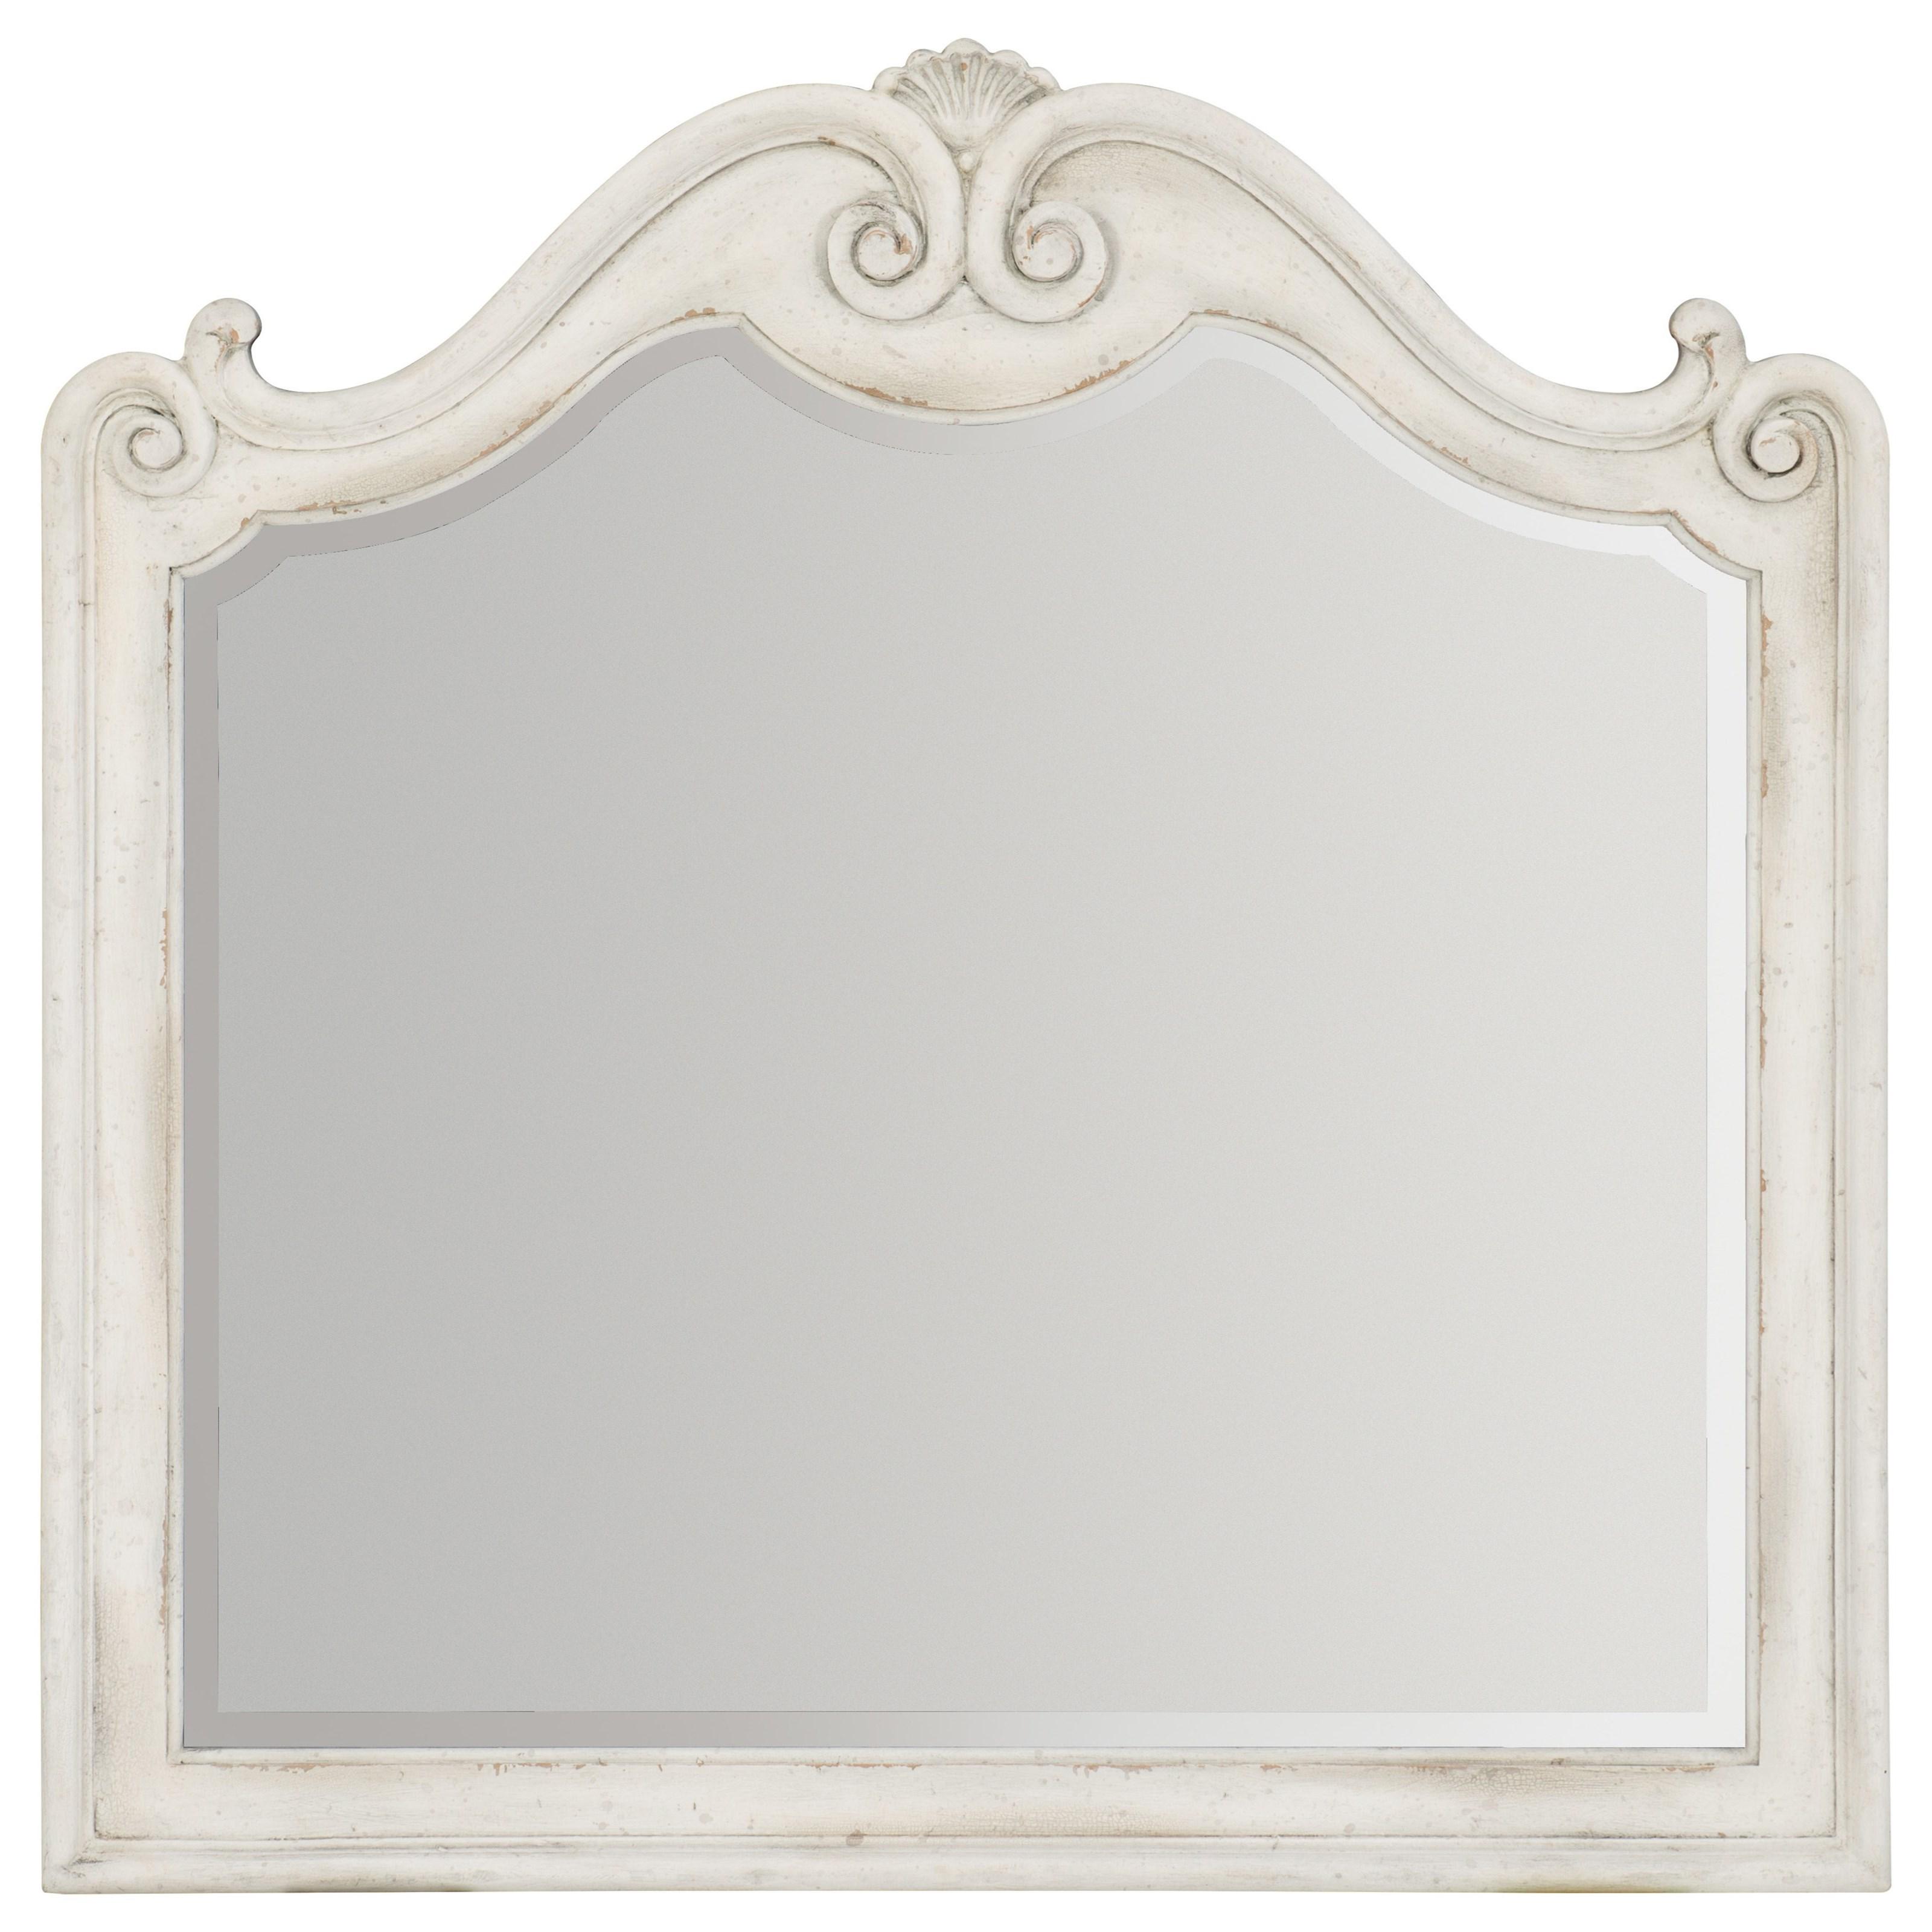 Arabella Mirror by Hooker Furniture at Miller Waldrop Furniture and Decor